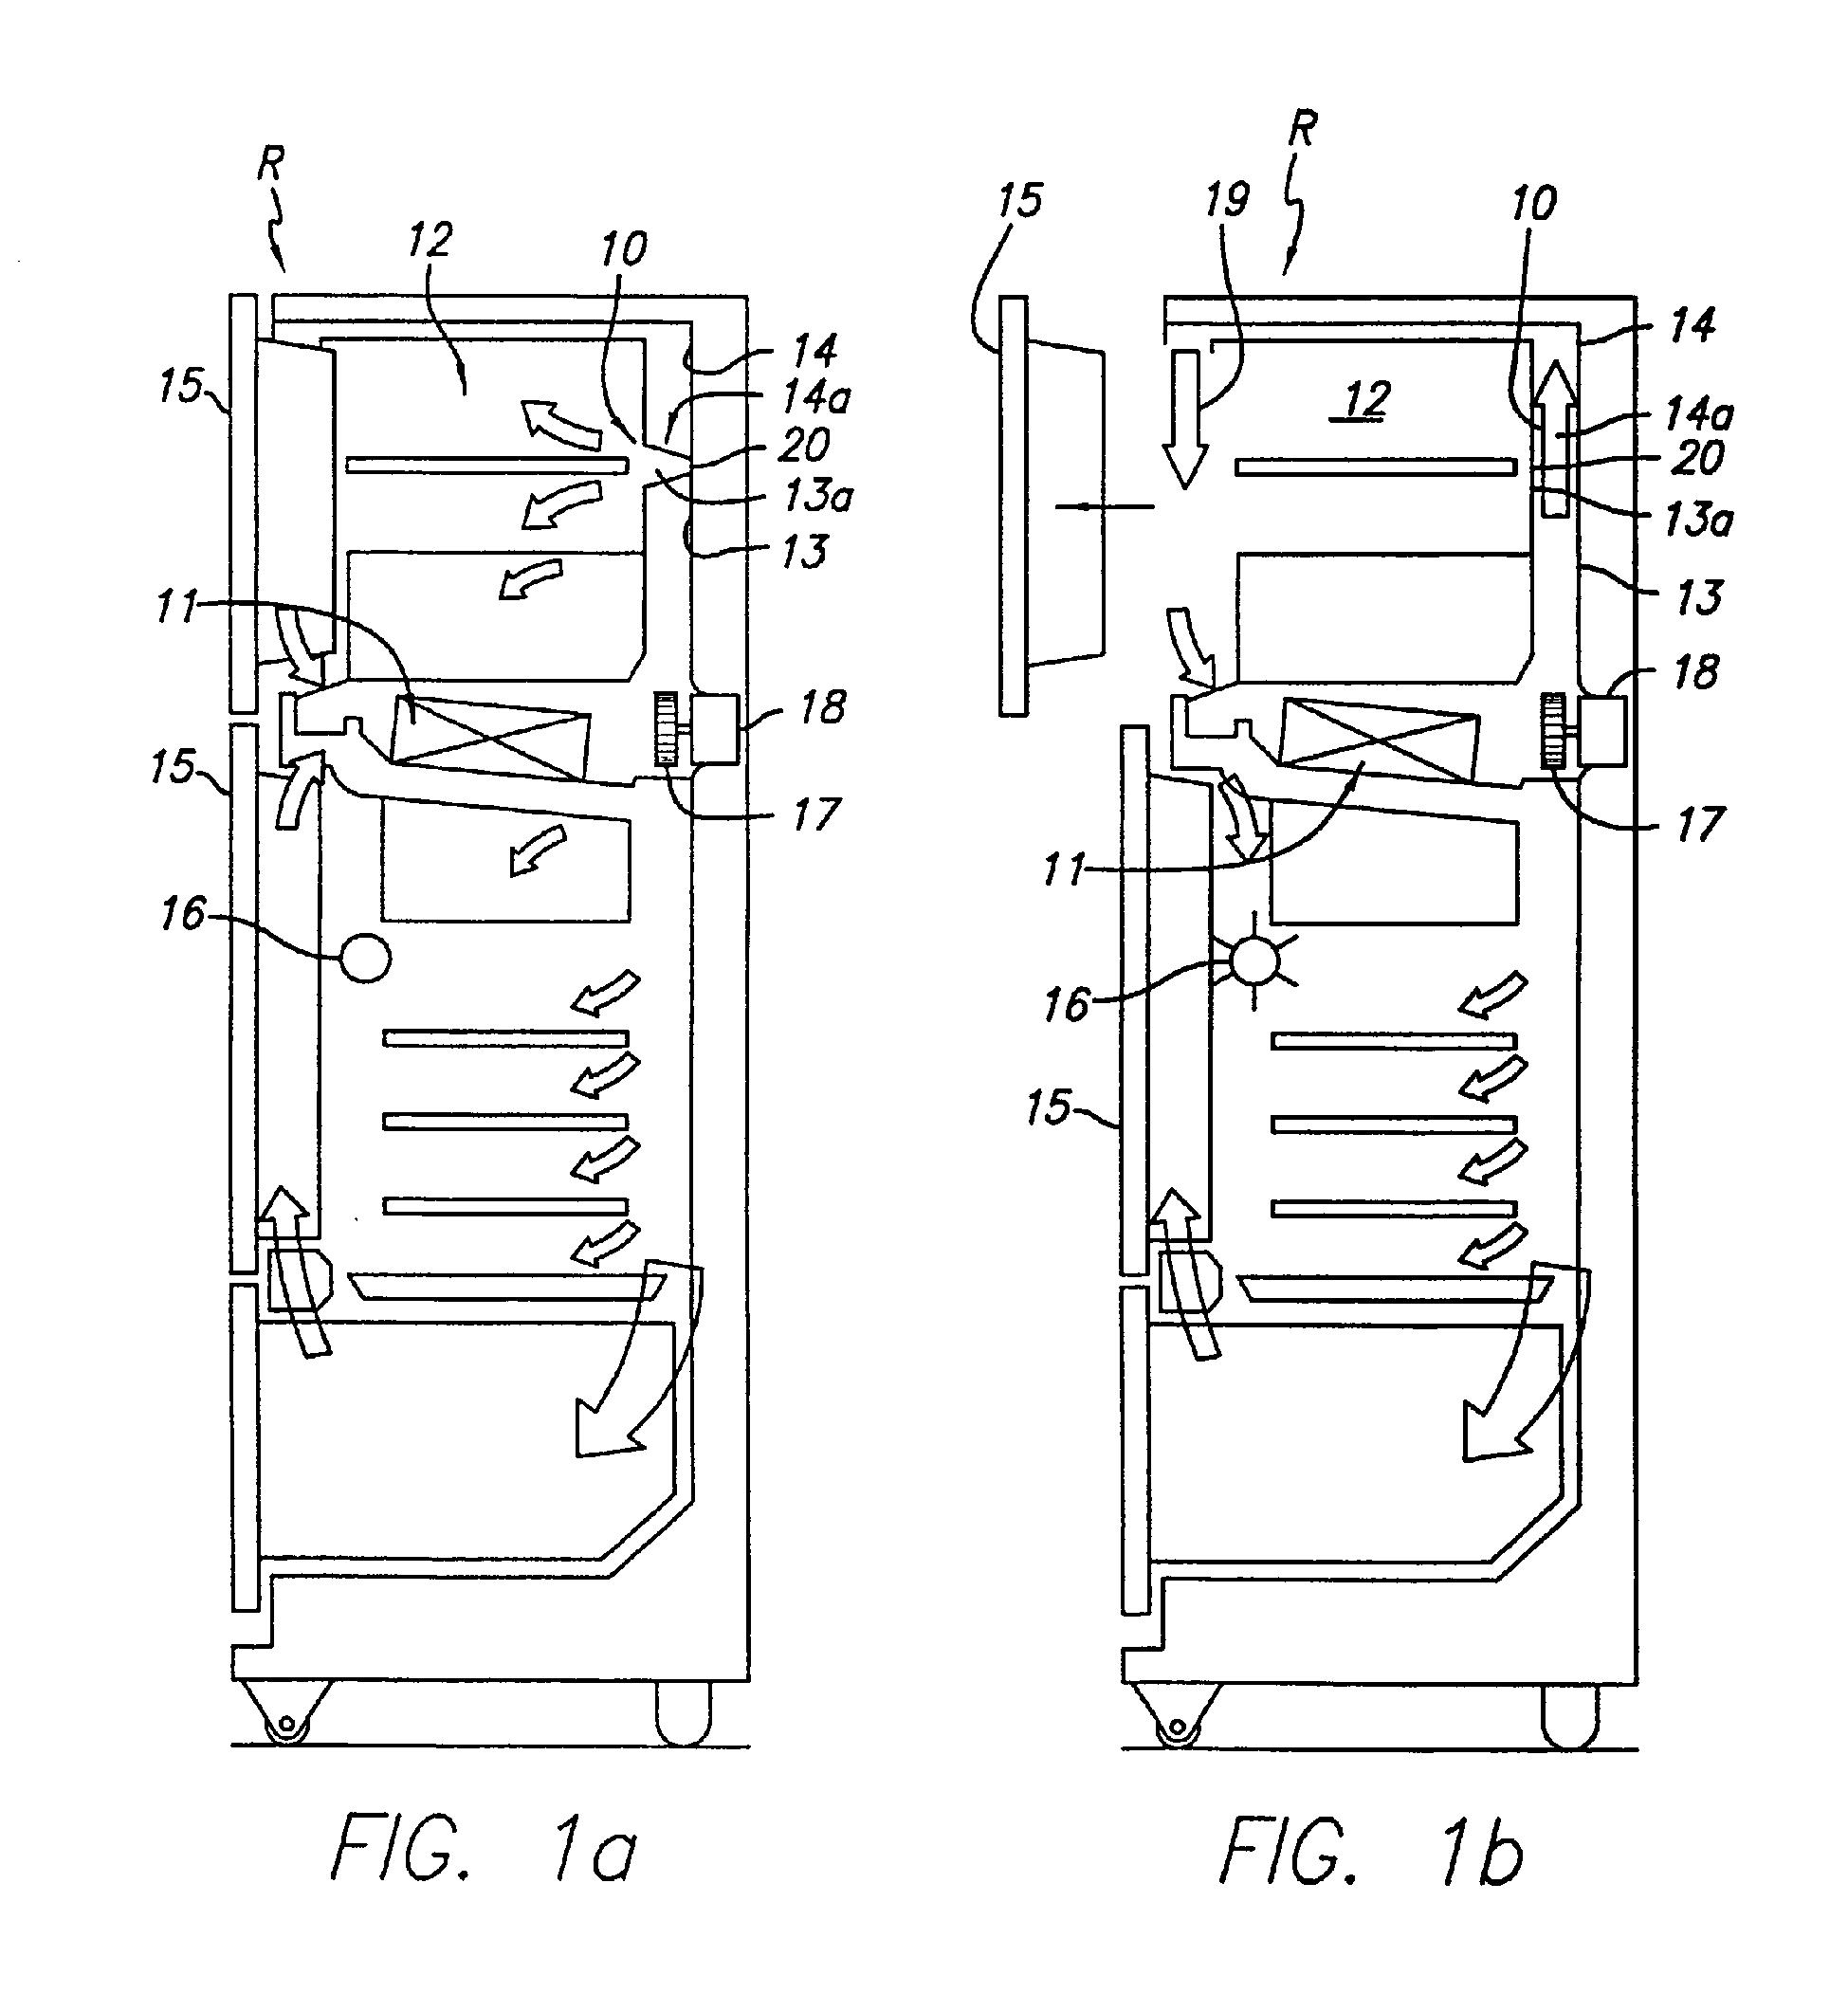 Damper Door Refrigerator & Refrigerator D&er Assembly